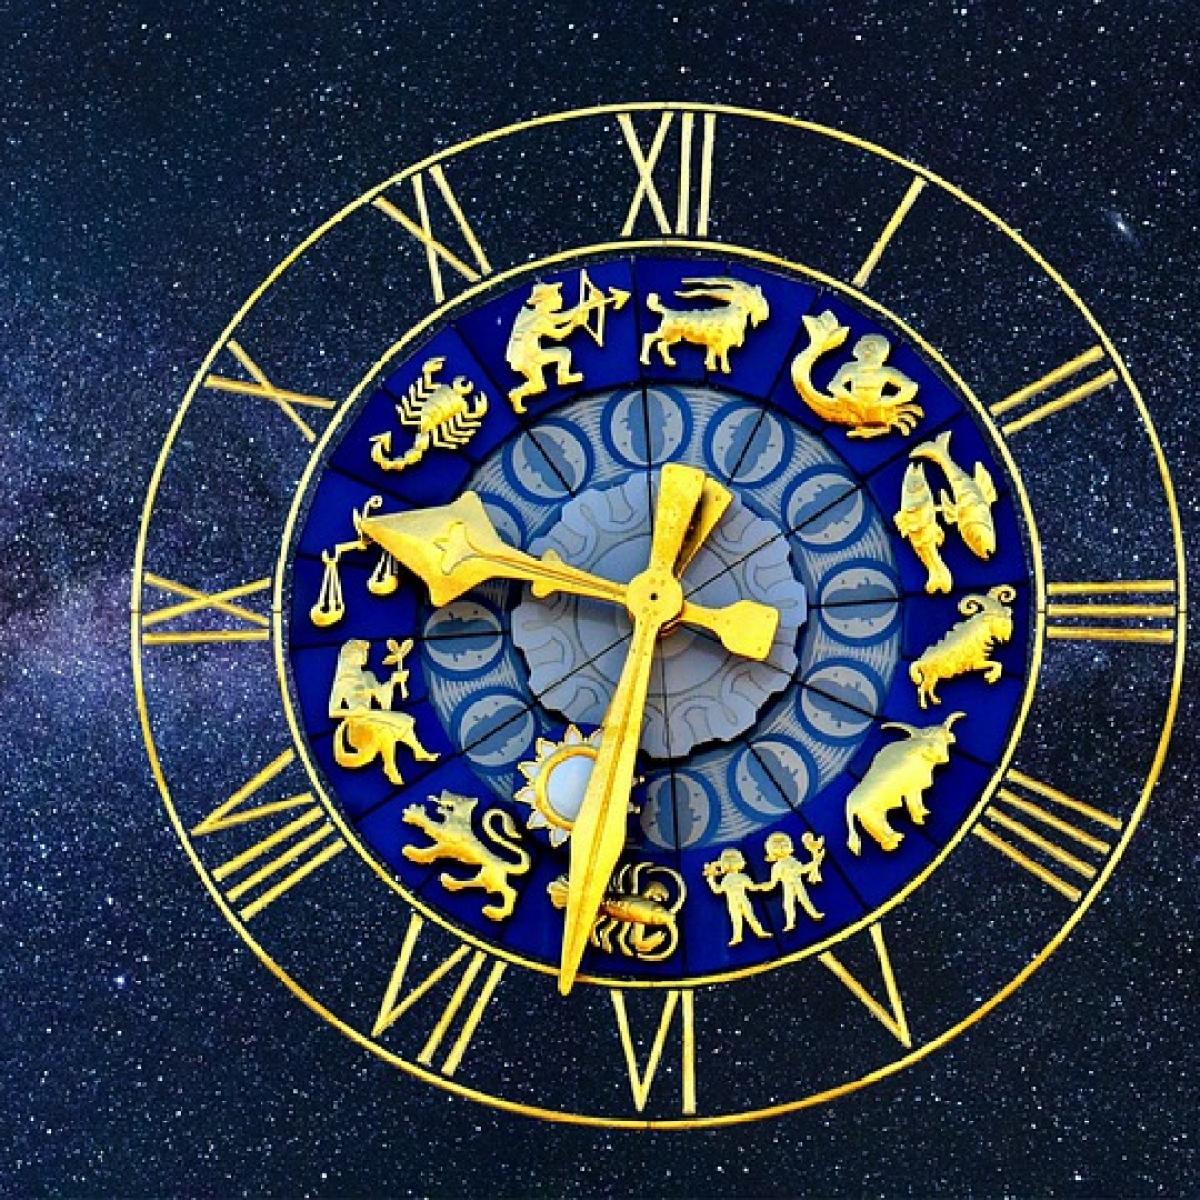 Daily Horoscope for Thursday, June 25, 2020, for all zodiac signs by astrologer Nilikash P Pradhan